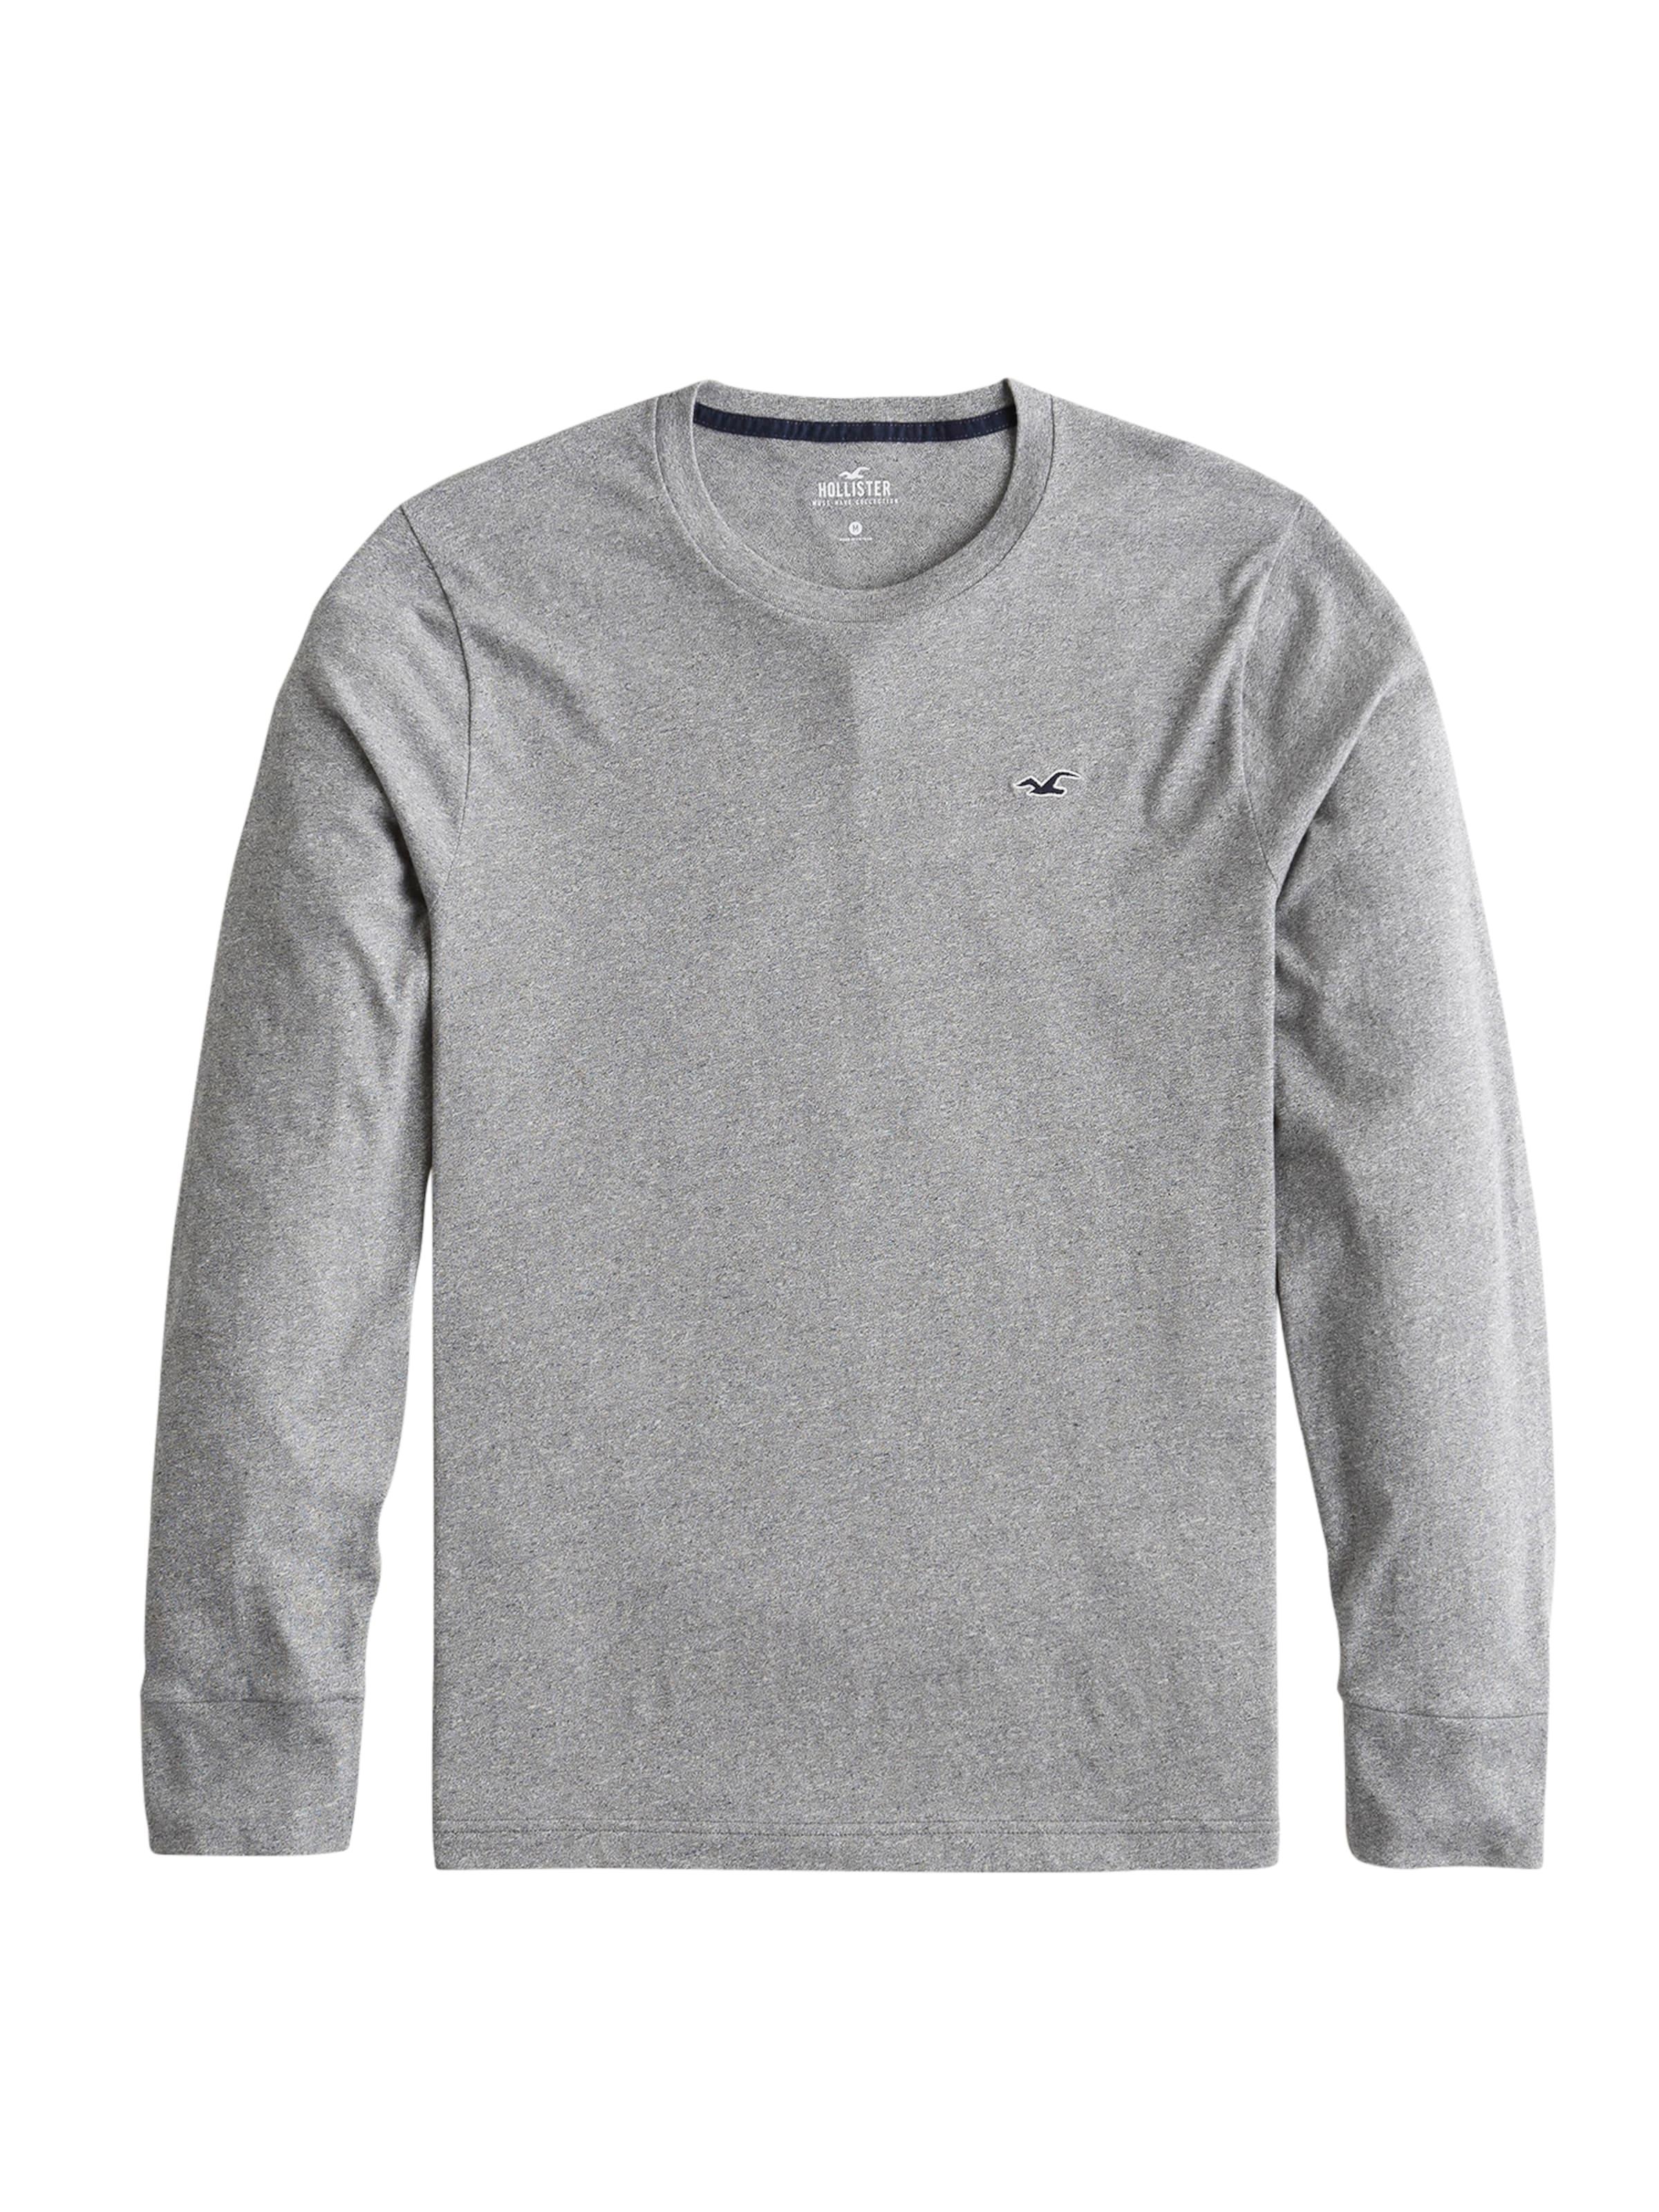 En Ls T Straight Noir Crew 6cc' Hem mh Hollister 'bts19 shirt DH9WYE2I